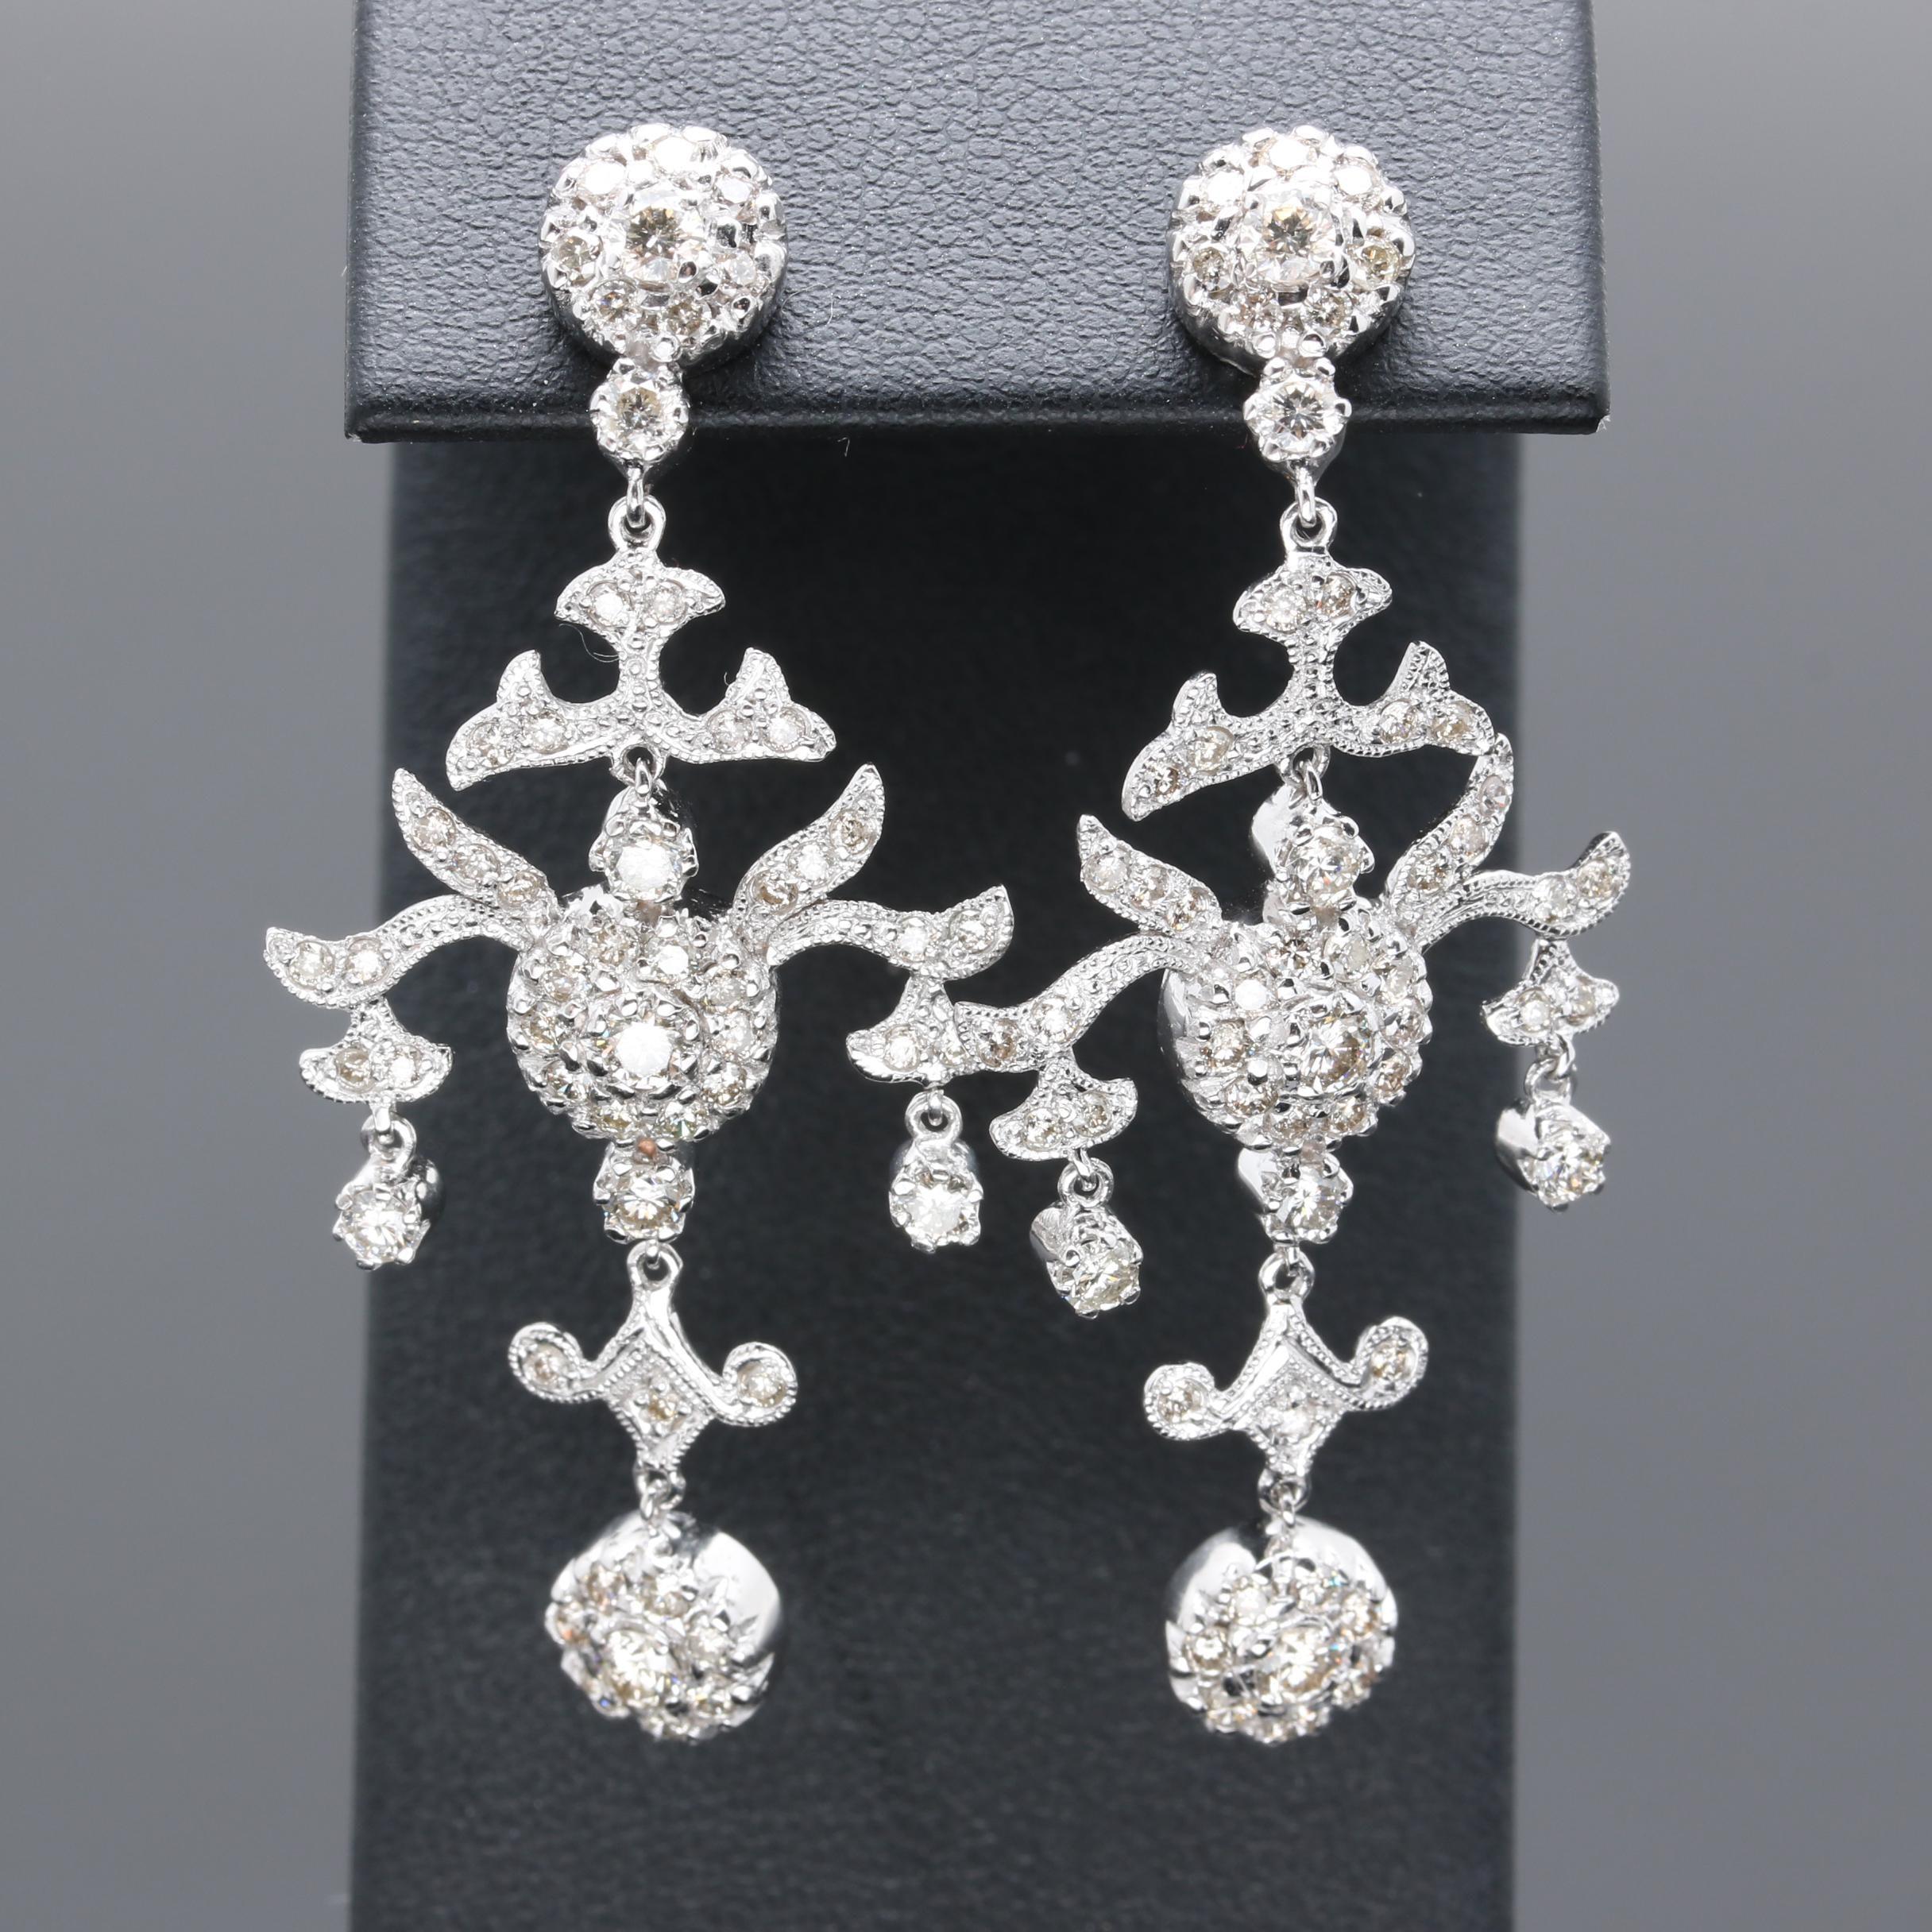 14K White Gold 2.75 CTW Diamond Chandelier Earrings